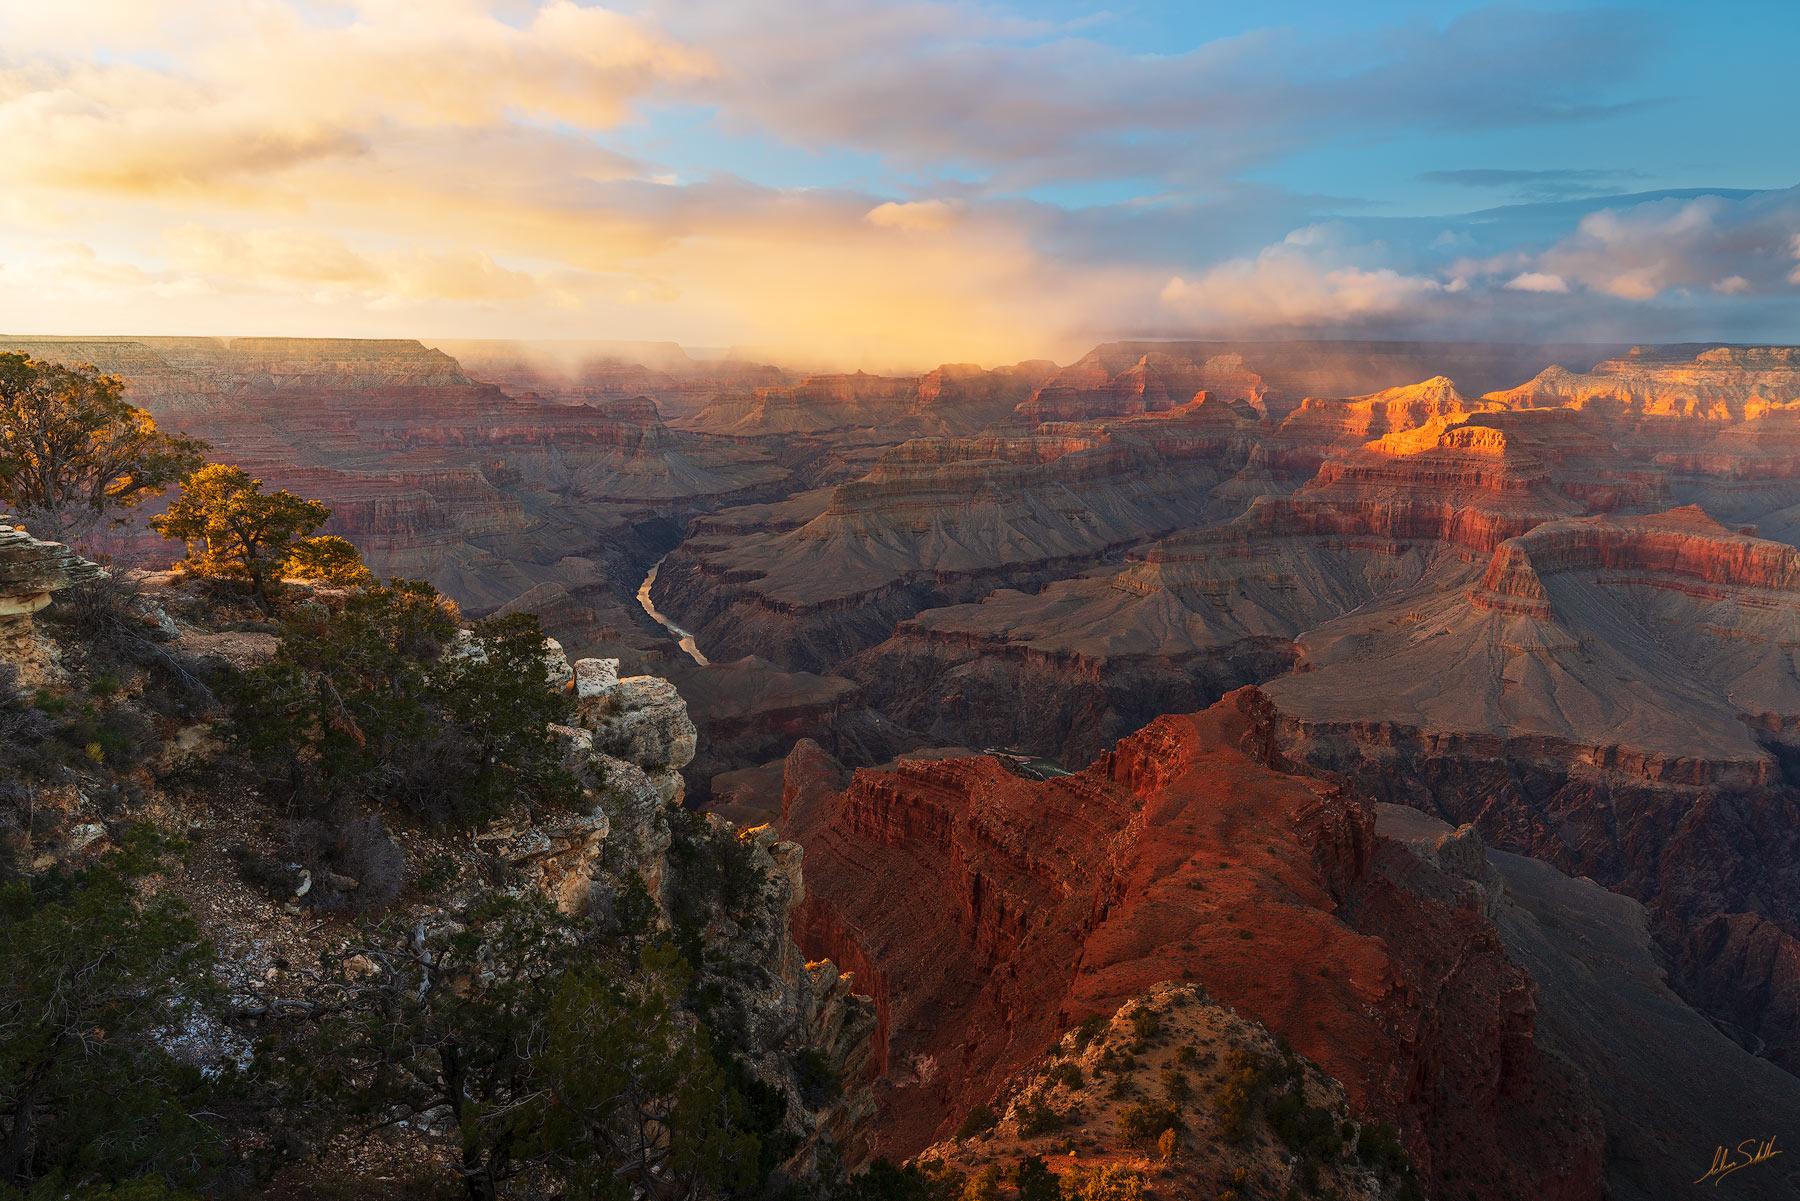 Arizona, Colorado River, Colorado River, Grand Canyon, Mojave Point, National Park, South Rim, photo